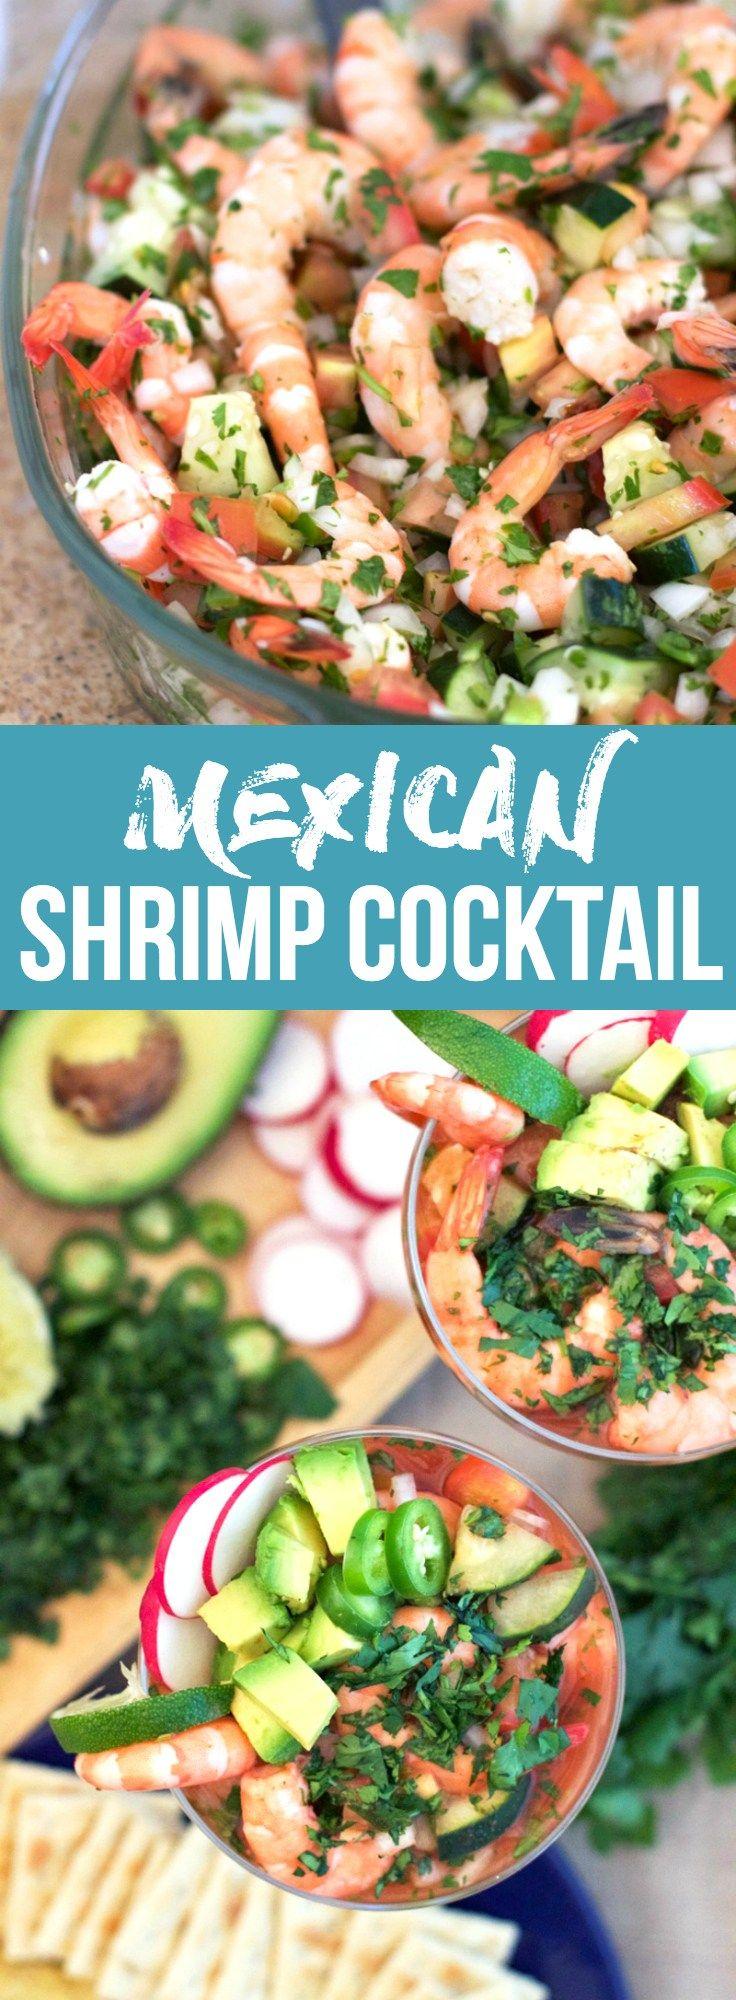 Mexican Shrimp Cocktail | Bits of Umami